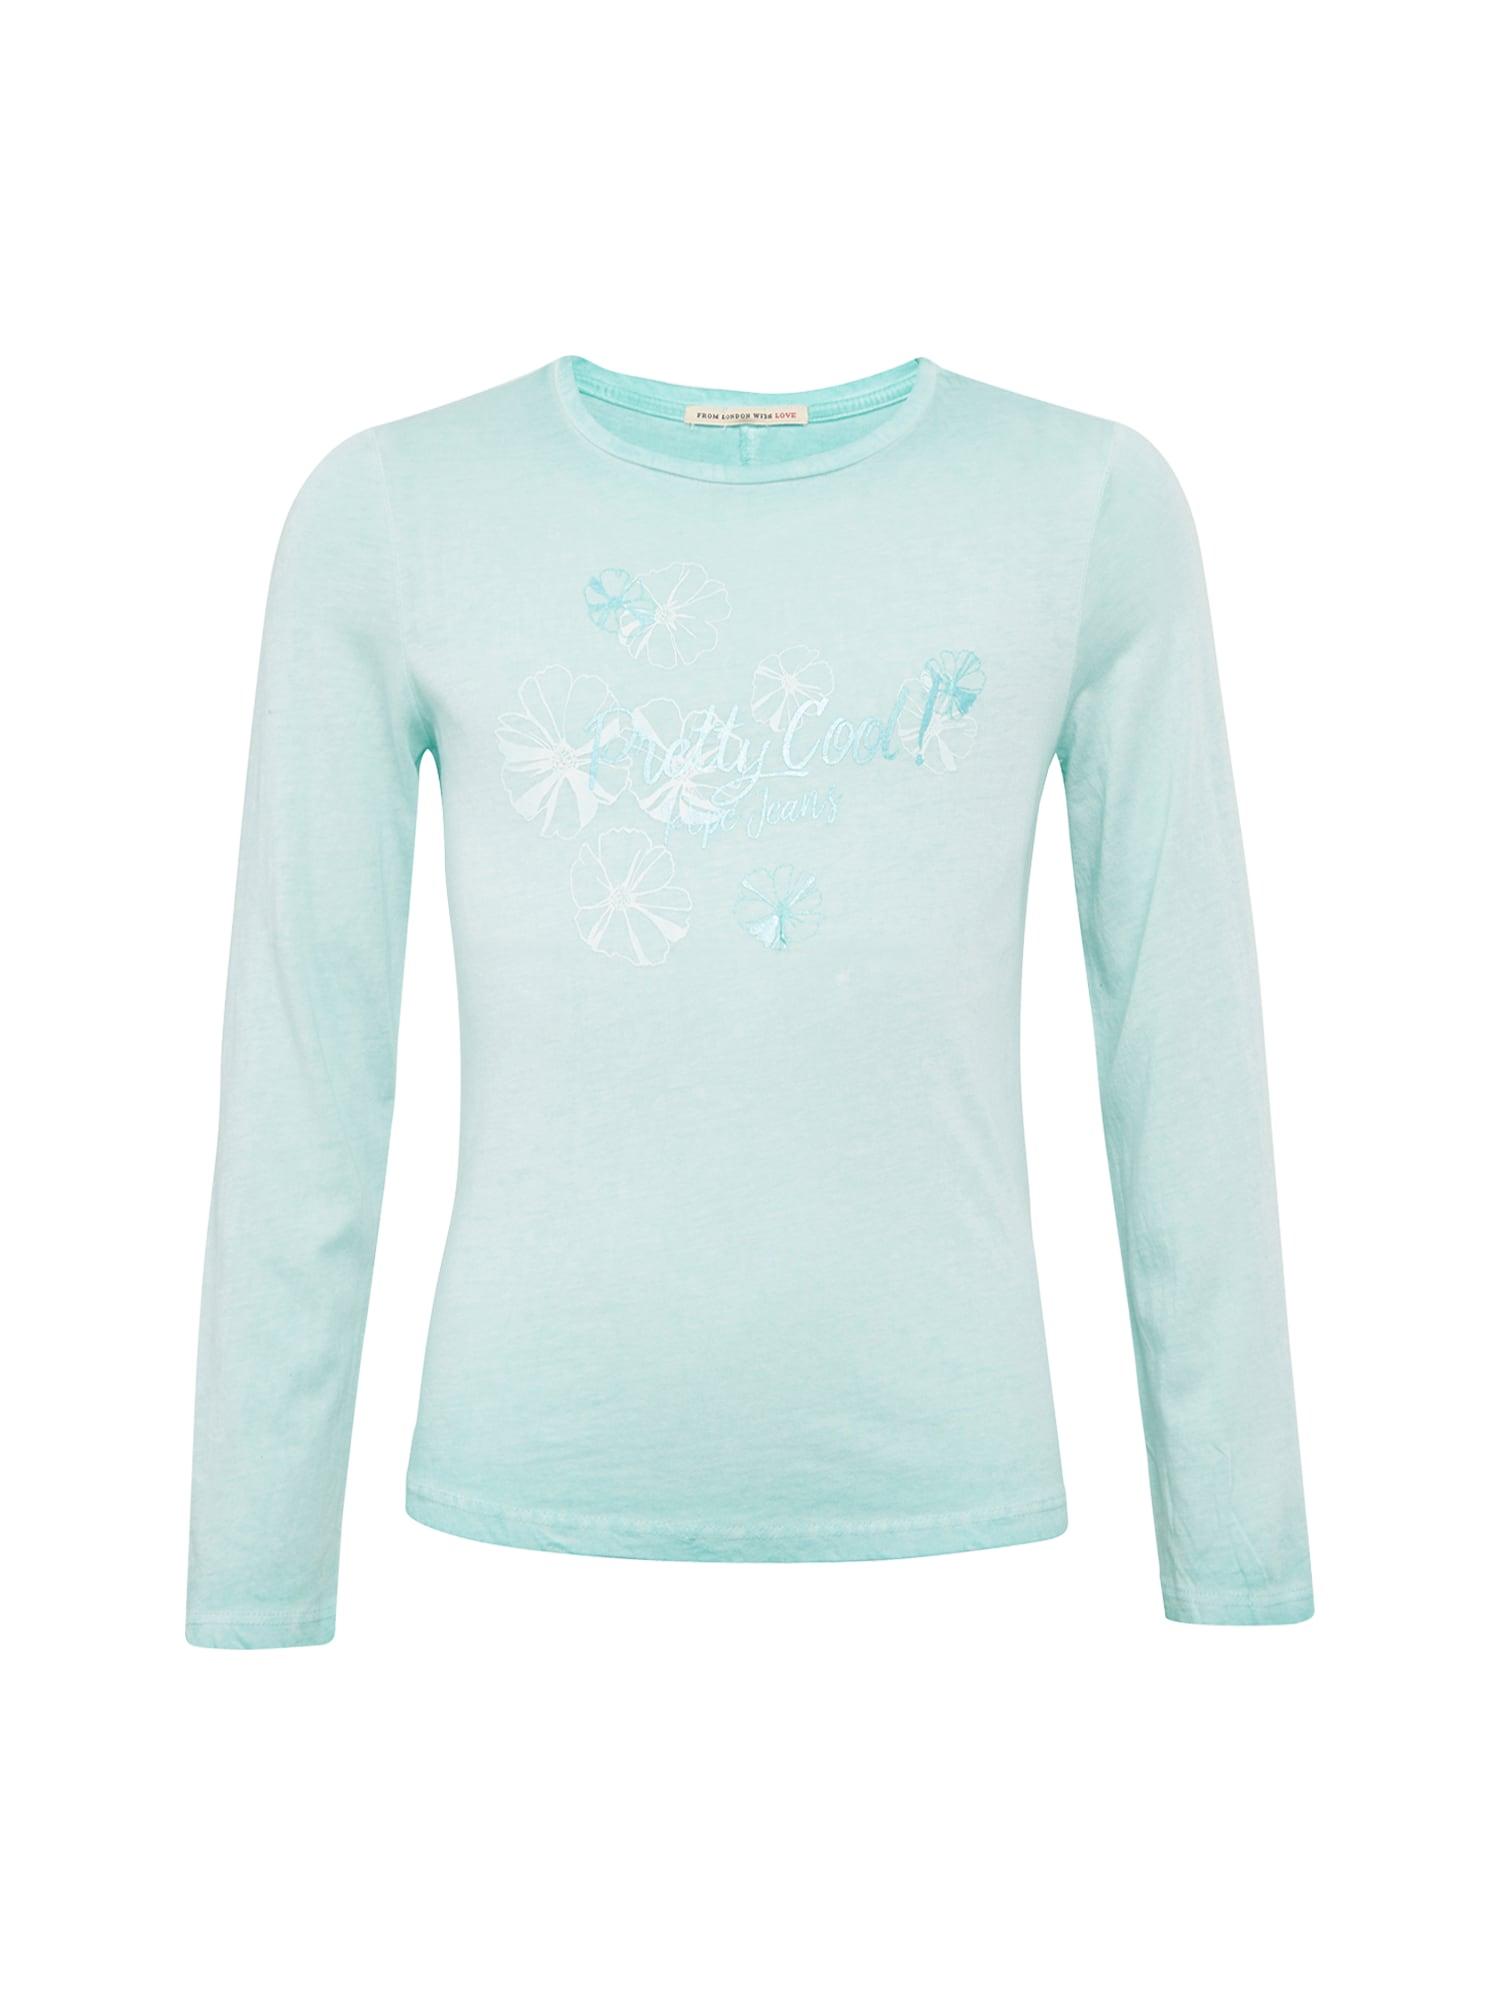 Pepe Jeans Meisjes Shirt ADALIN JR turquoise parelwit